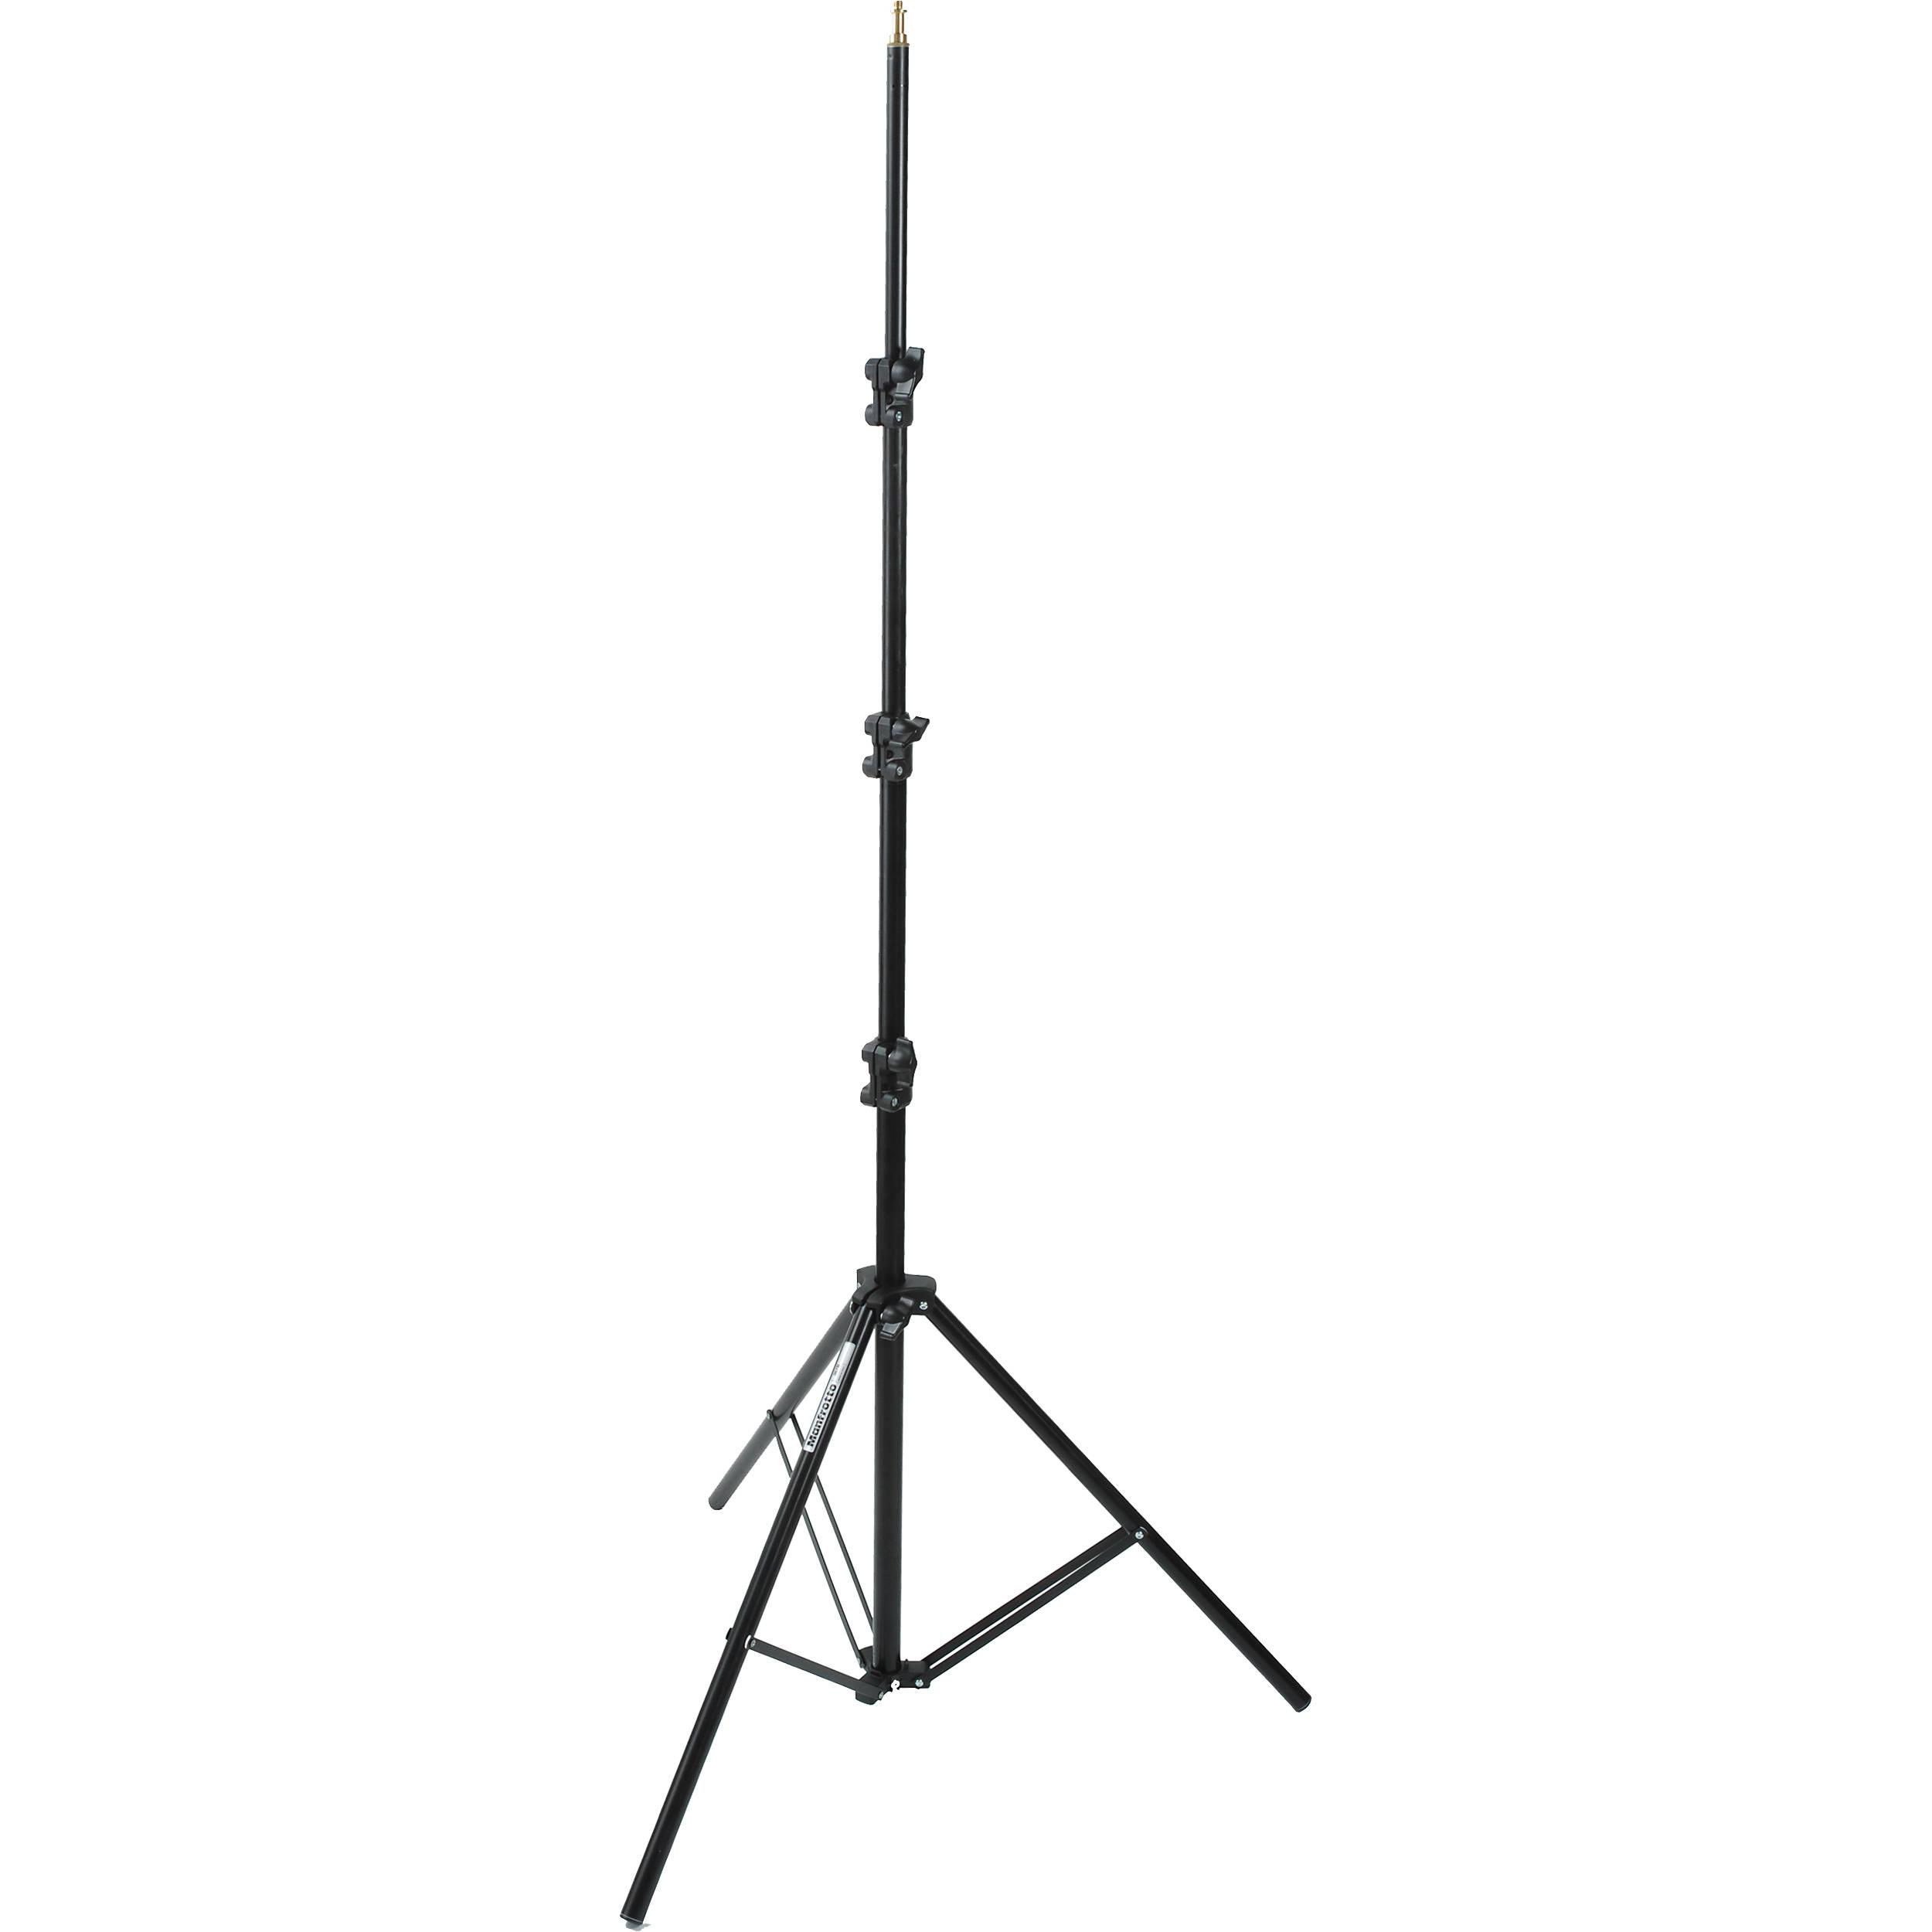 Manfrotto 367B Basic Light Stand